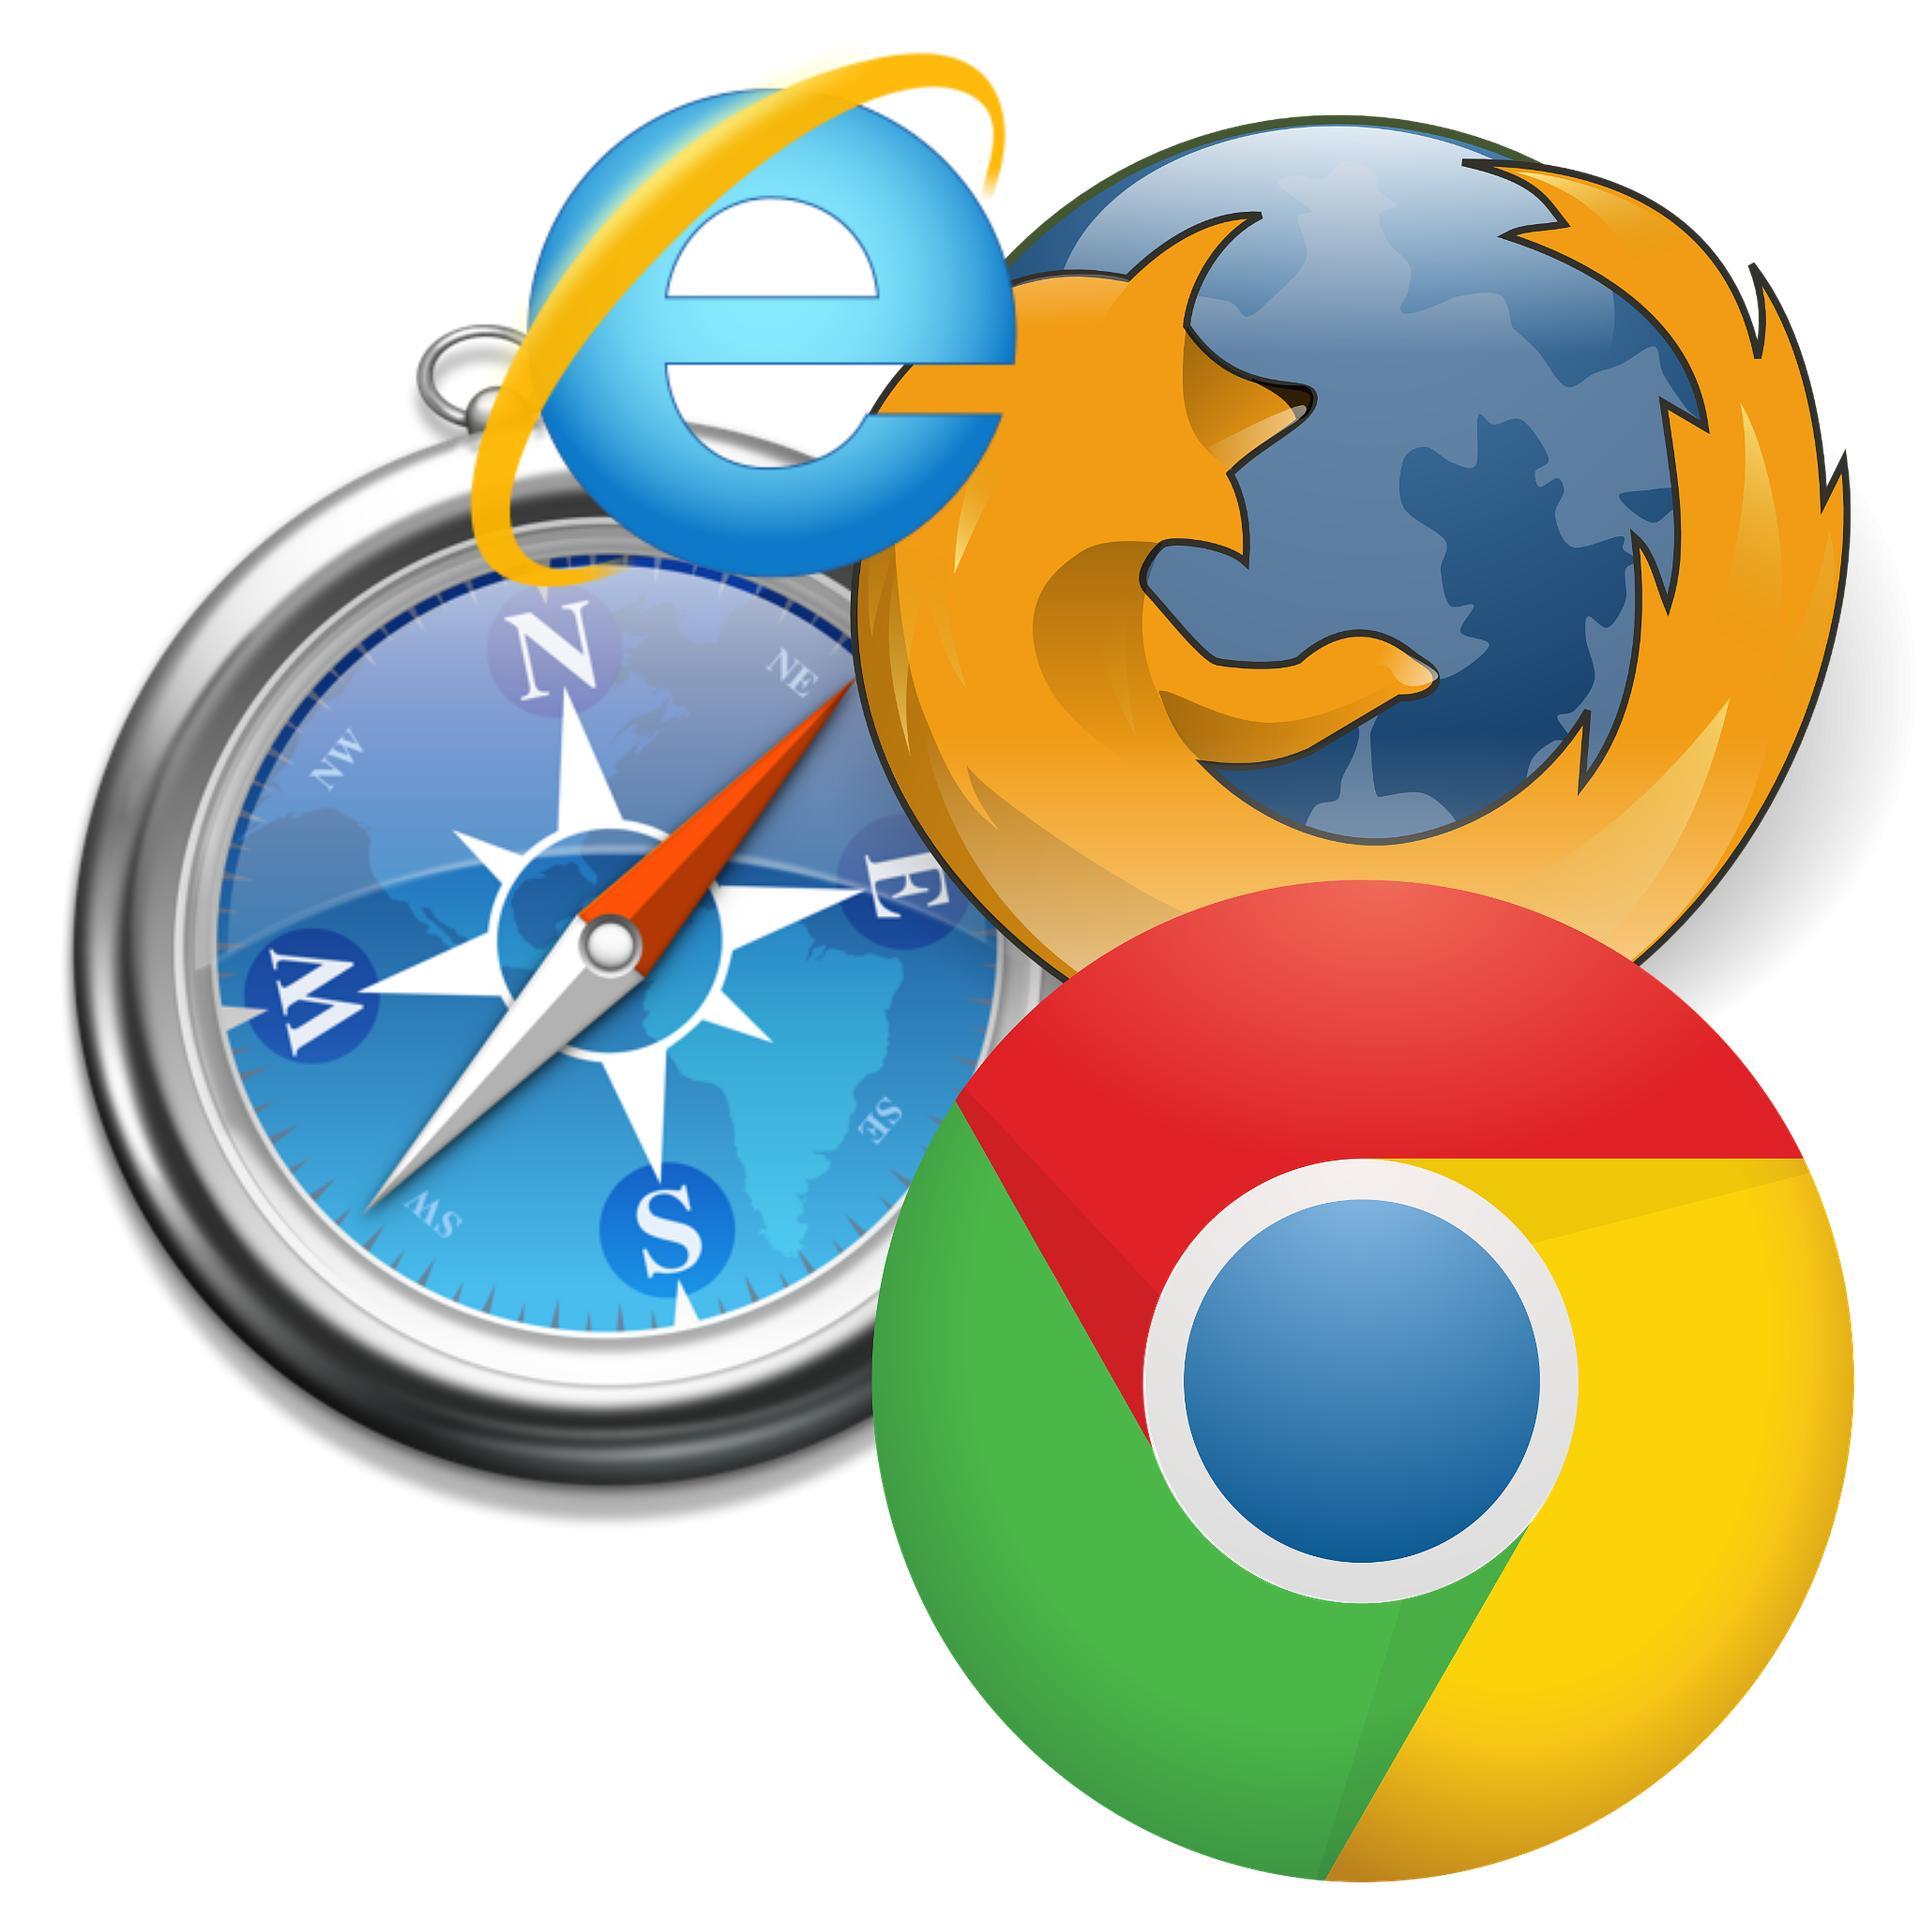 Какой браузер наAndroid самый быстрый? 7 реактивных решений